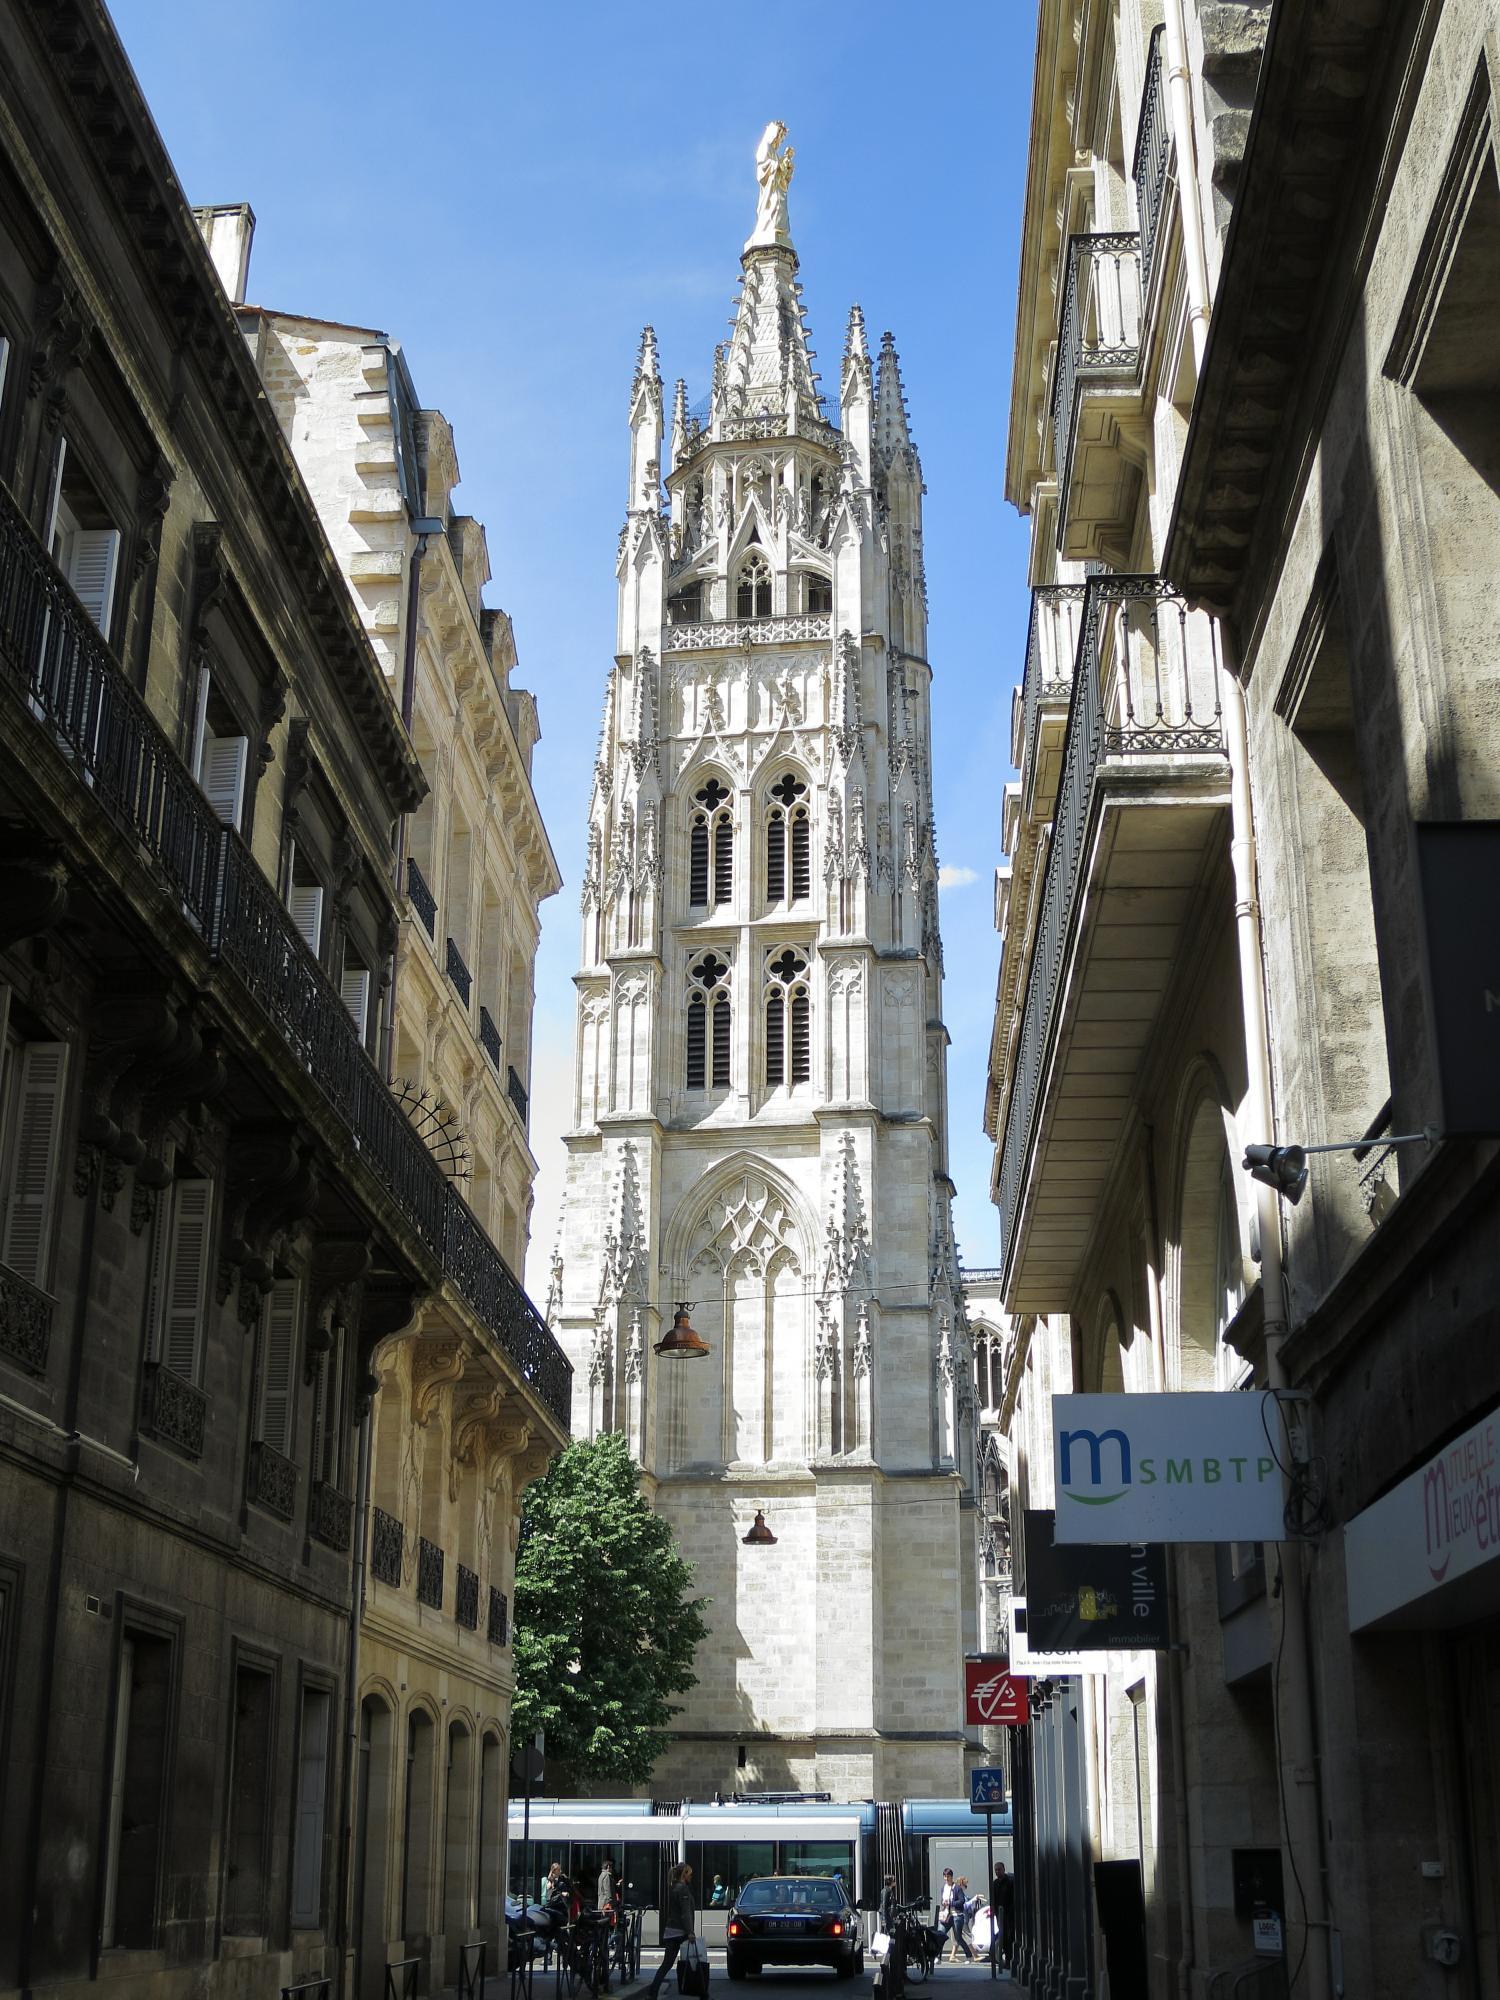 La tour Pey-Berland, next to the Bordeaux Cathedral.